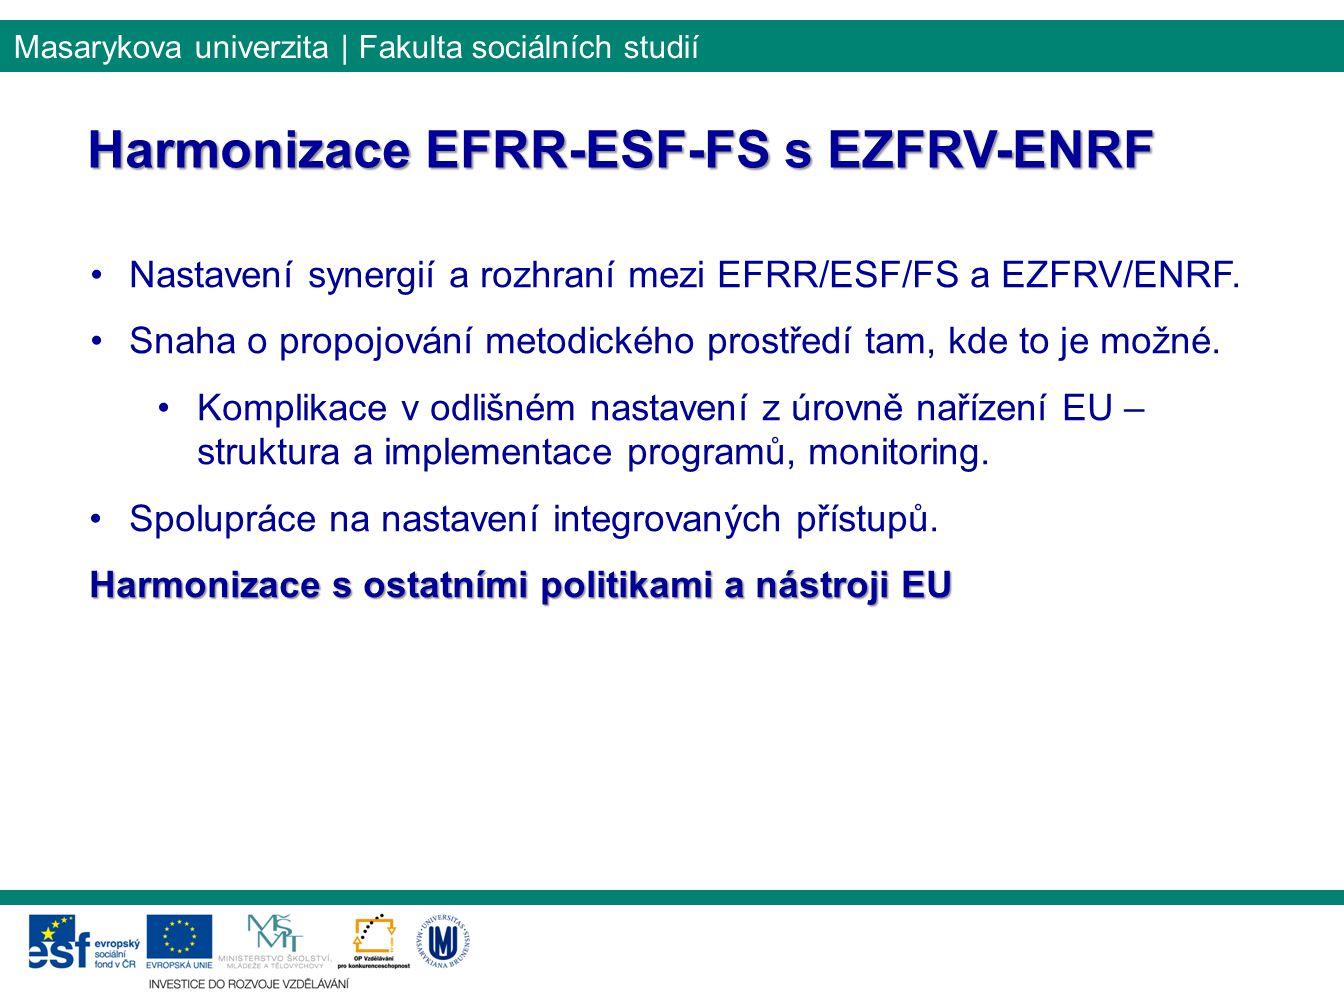 Harmonizace EFRR-ESF-FS s EZFRV-ENRF